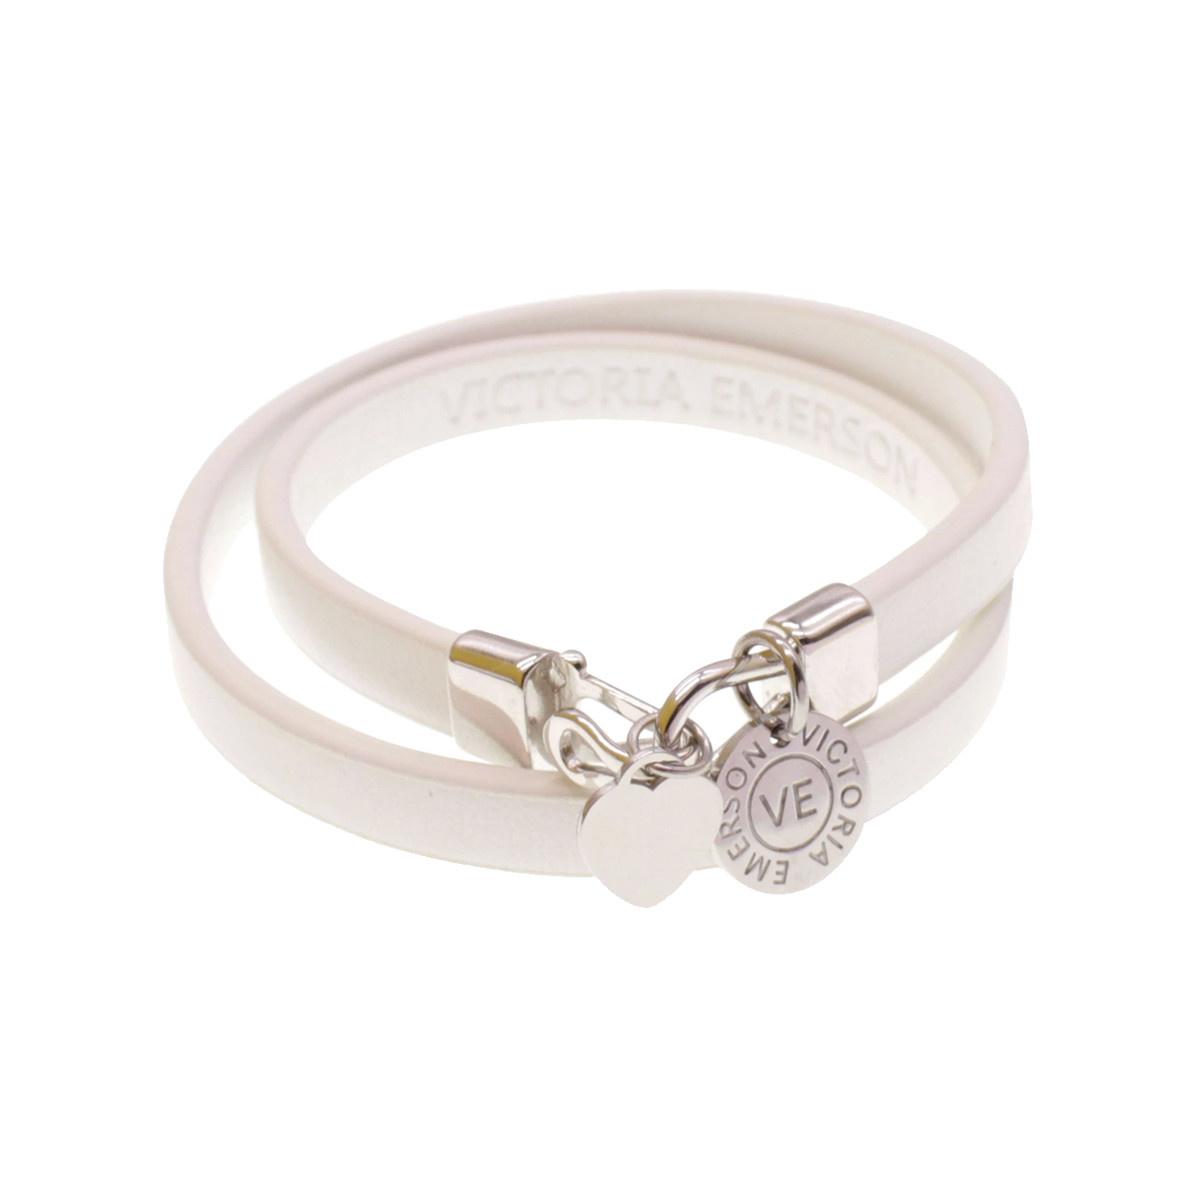 Victoria Emerson Victoria Emerson Heart Double Wrap Bracelet